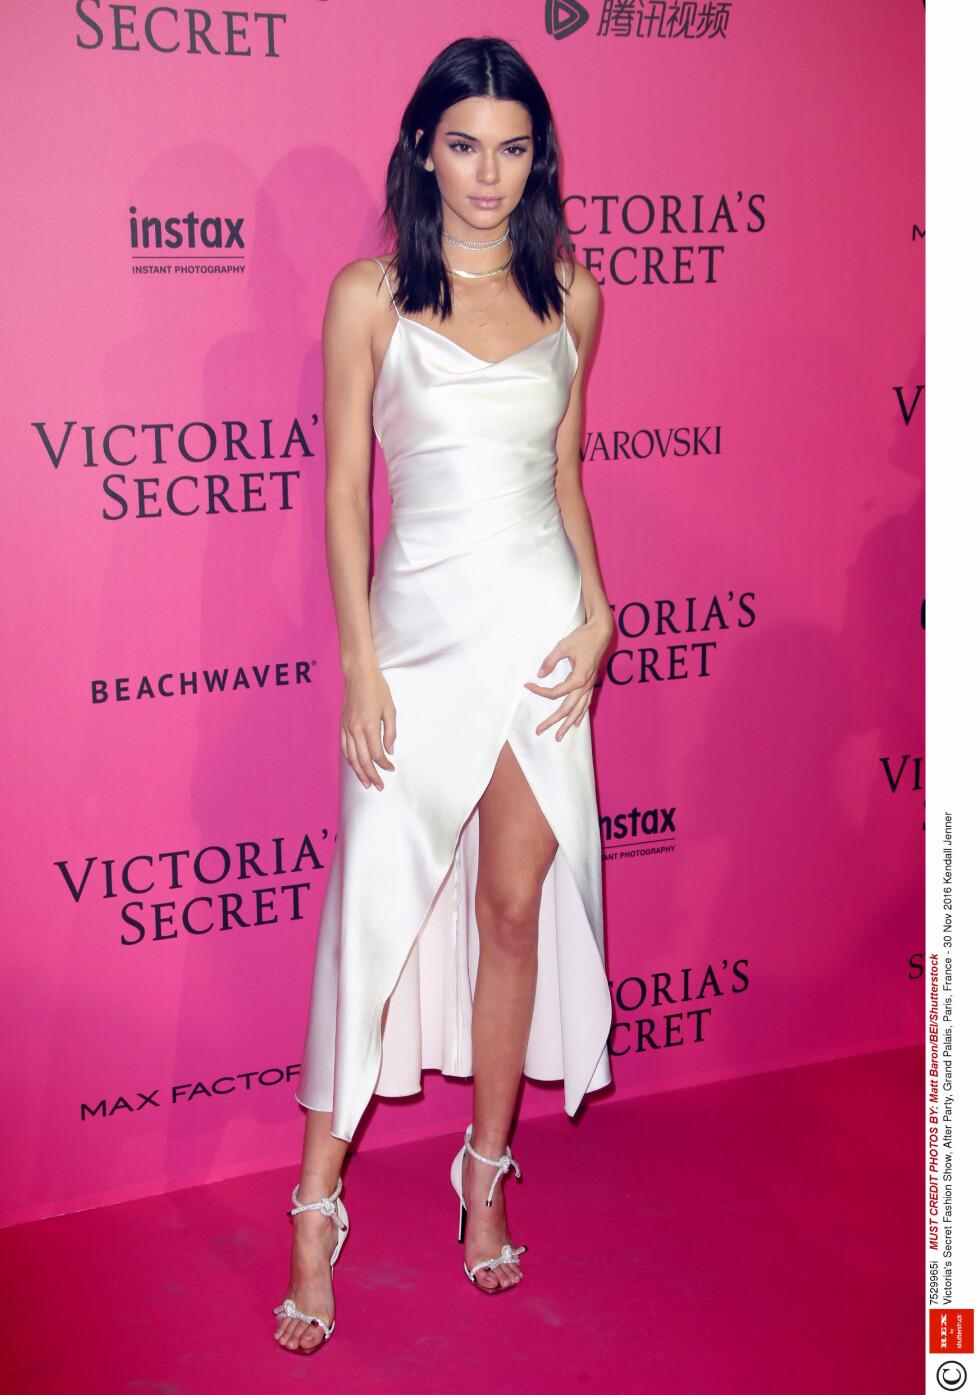 Mandatory Credit: Photo by Matt Baron/BEI/Shutterstock (7529965i) Kendall Jenner Victoria's Secret Fashion Show, After Party, Grand Palais, Paris, France - 30 Nov 2016